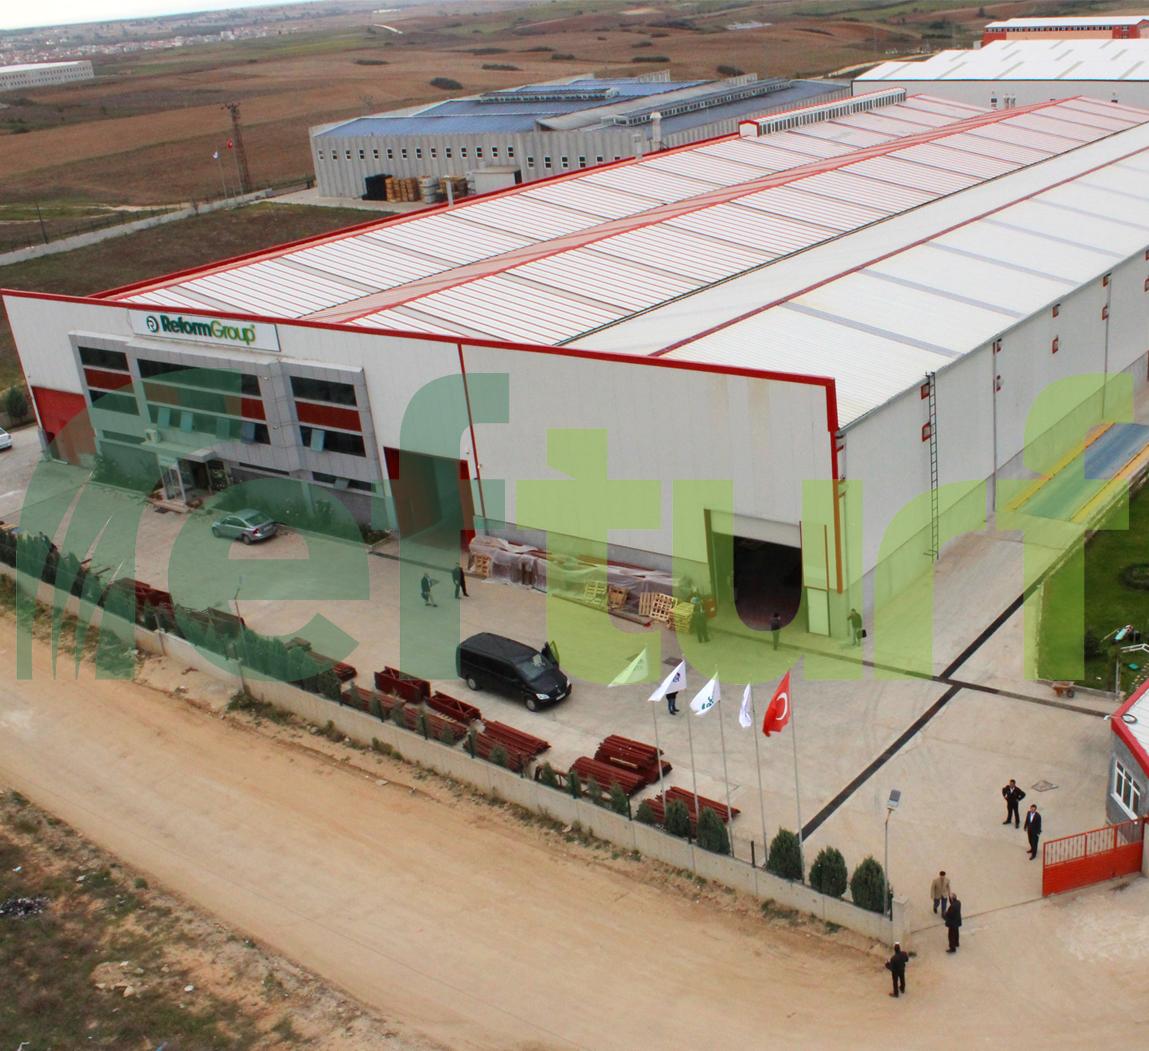 fabrika, reform fabrika, refturf fabrika, sentetik çim fabrikası, sentetik çim üreticisi,